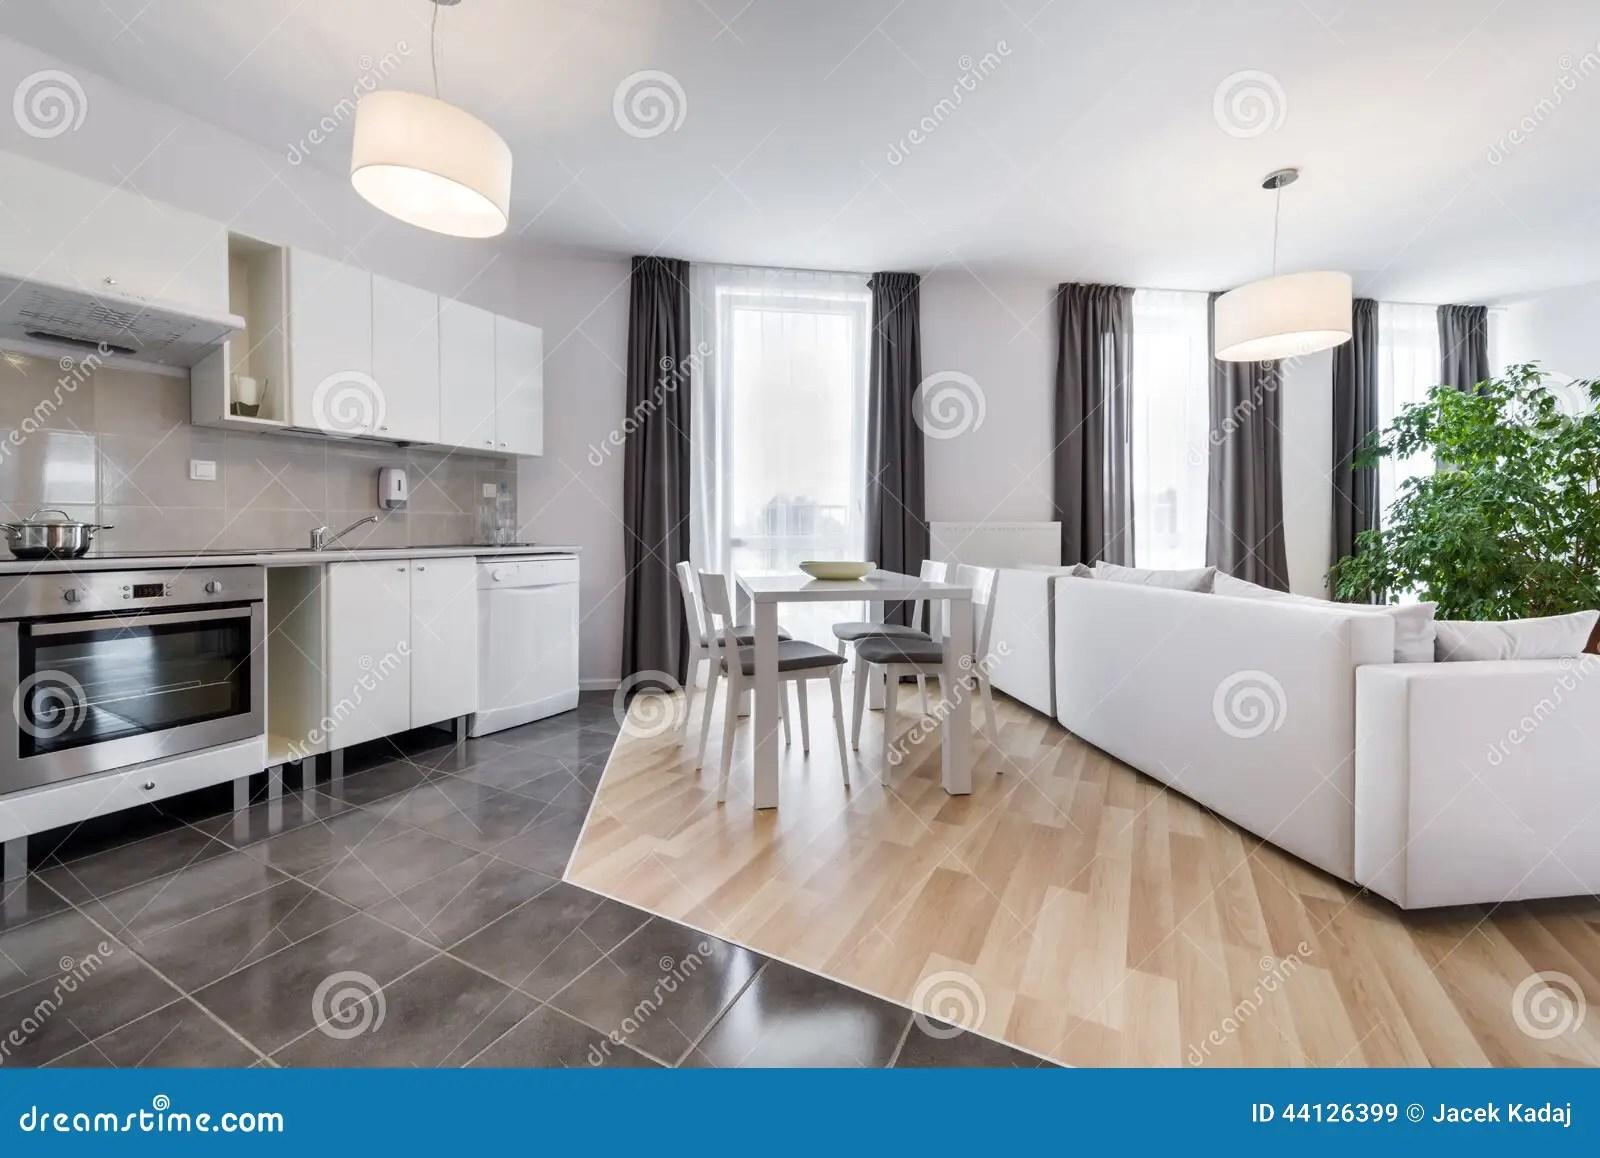 modern interior design living room kitchen stock photo image cost house floor plans bid cozy cost interior designer kitchen